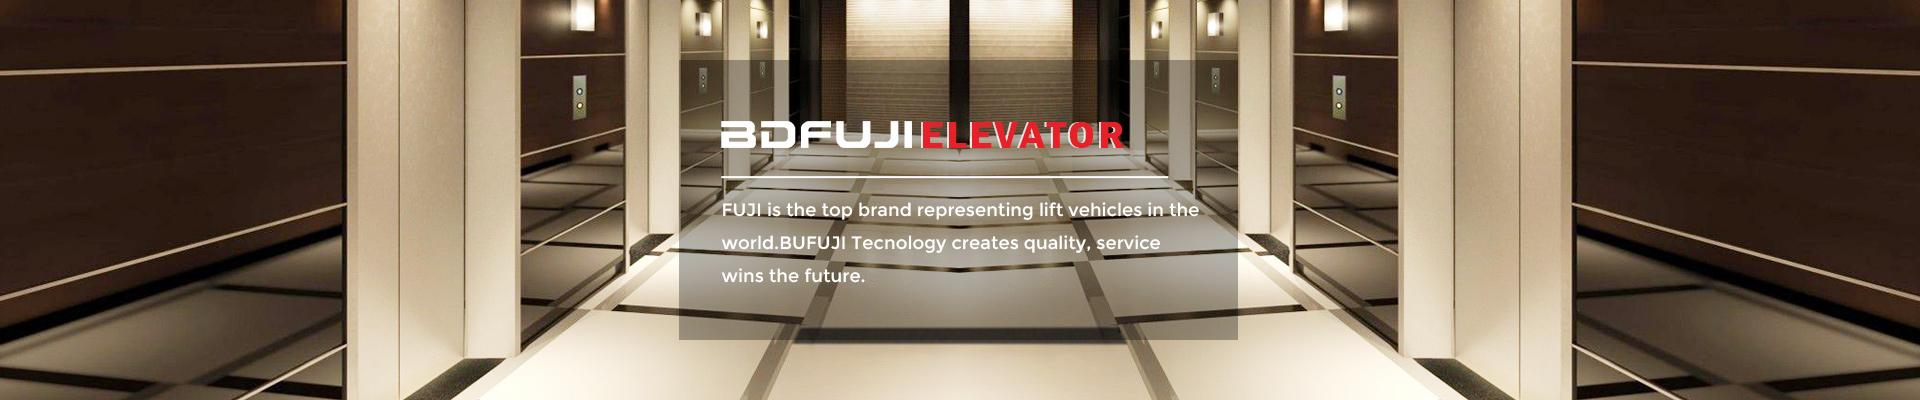 Suzhou BDFUJI Elevator Co., Ltd.